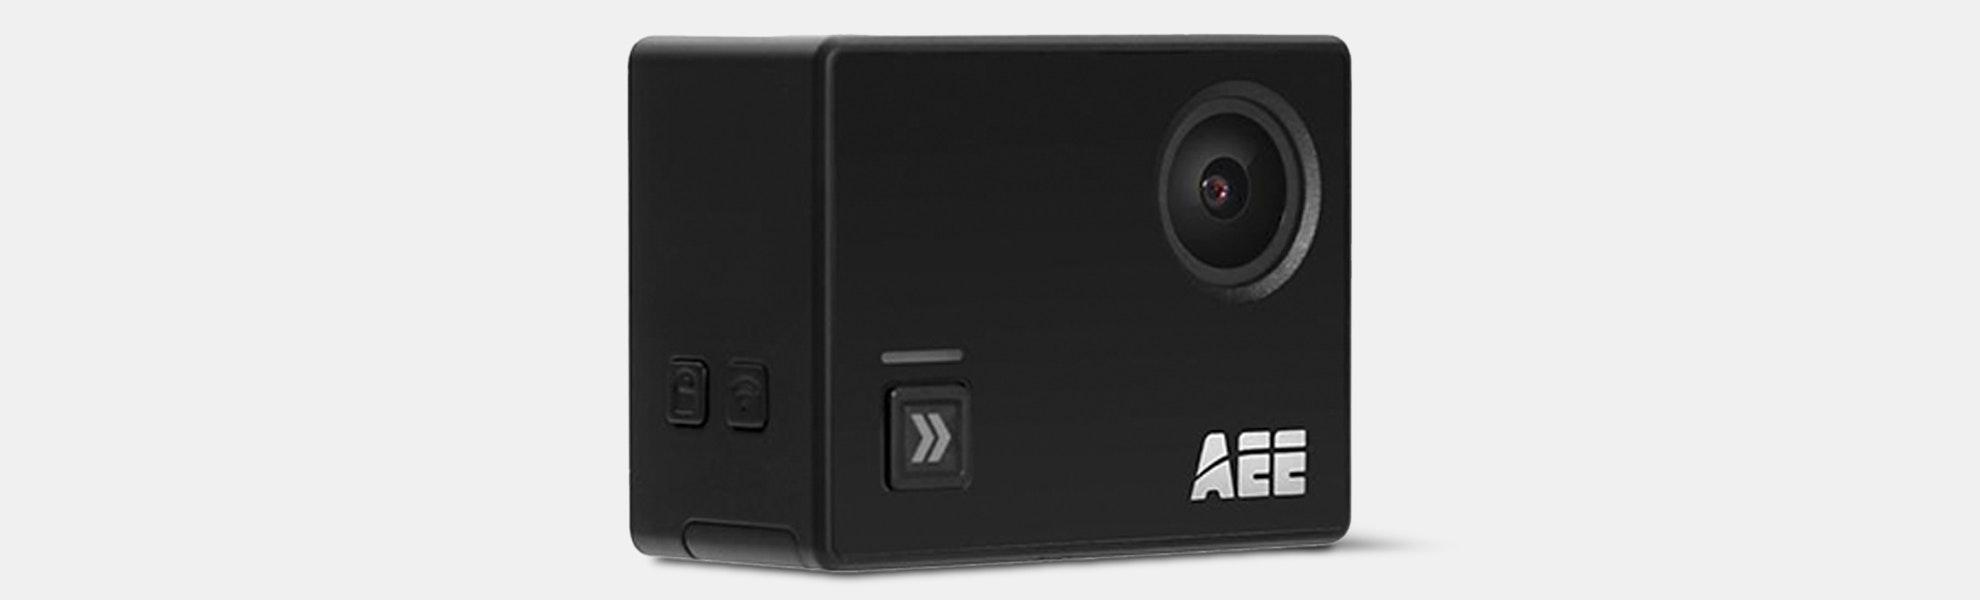 AEE Lyfe Shadow 4K Action Camera